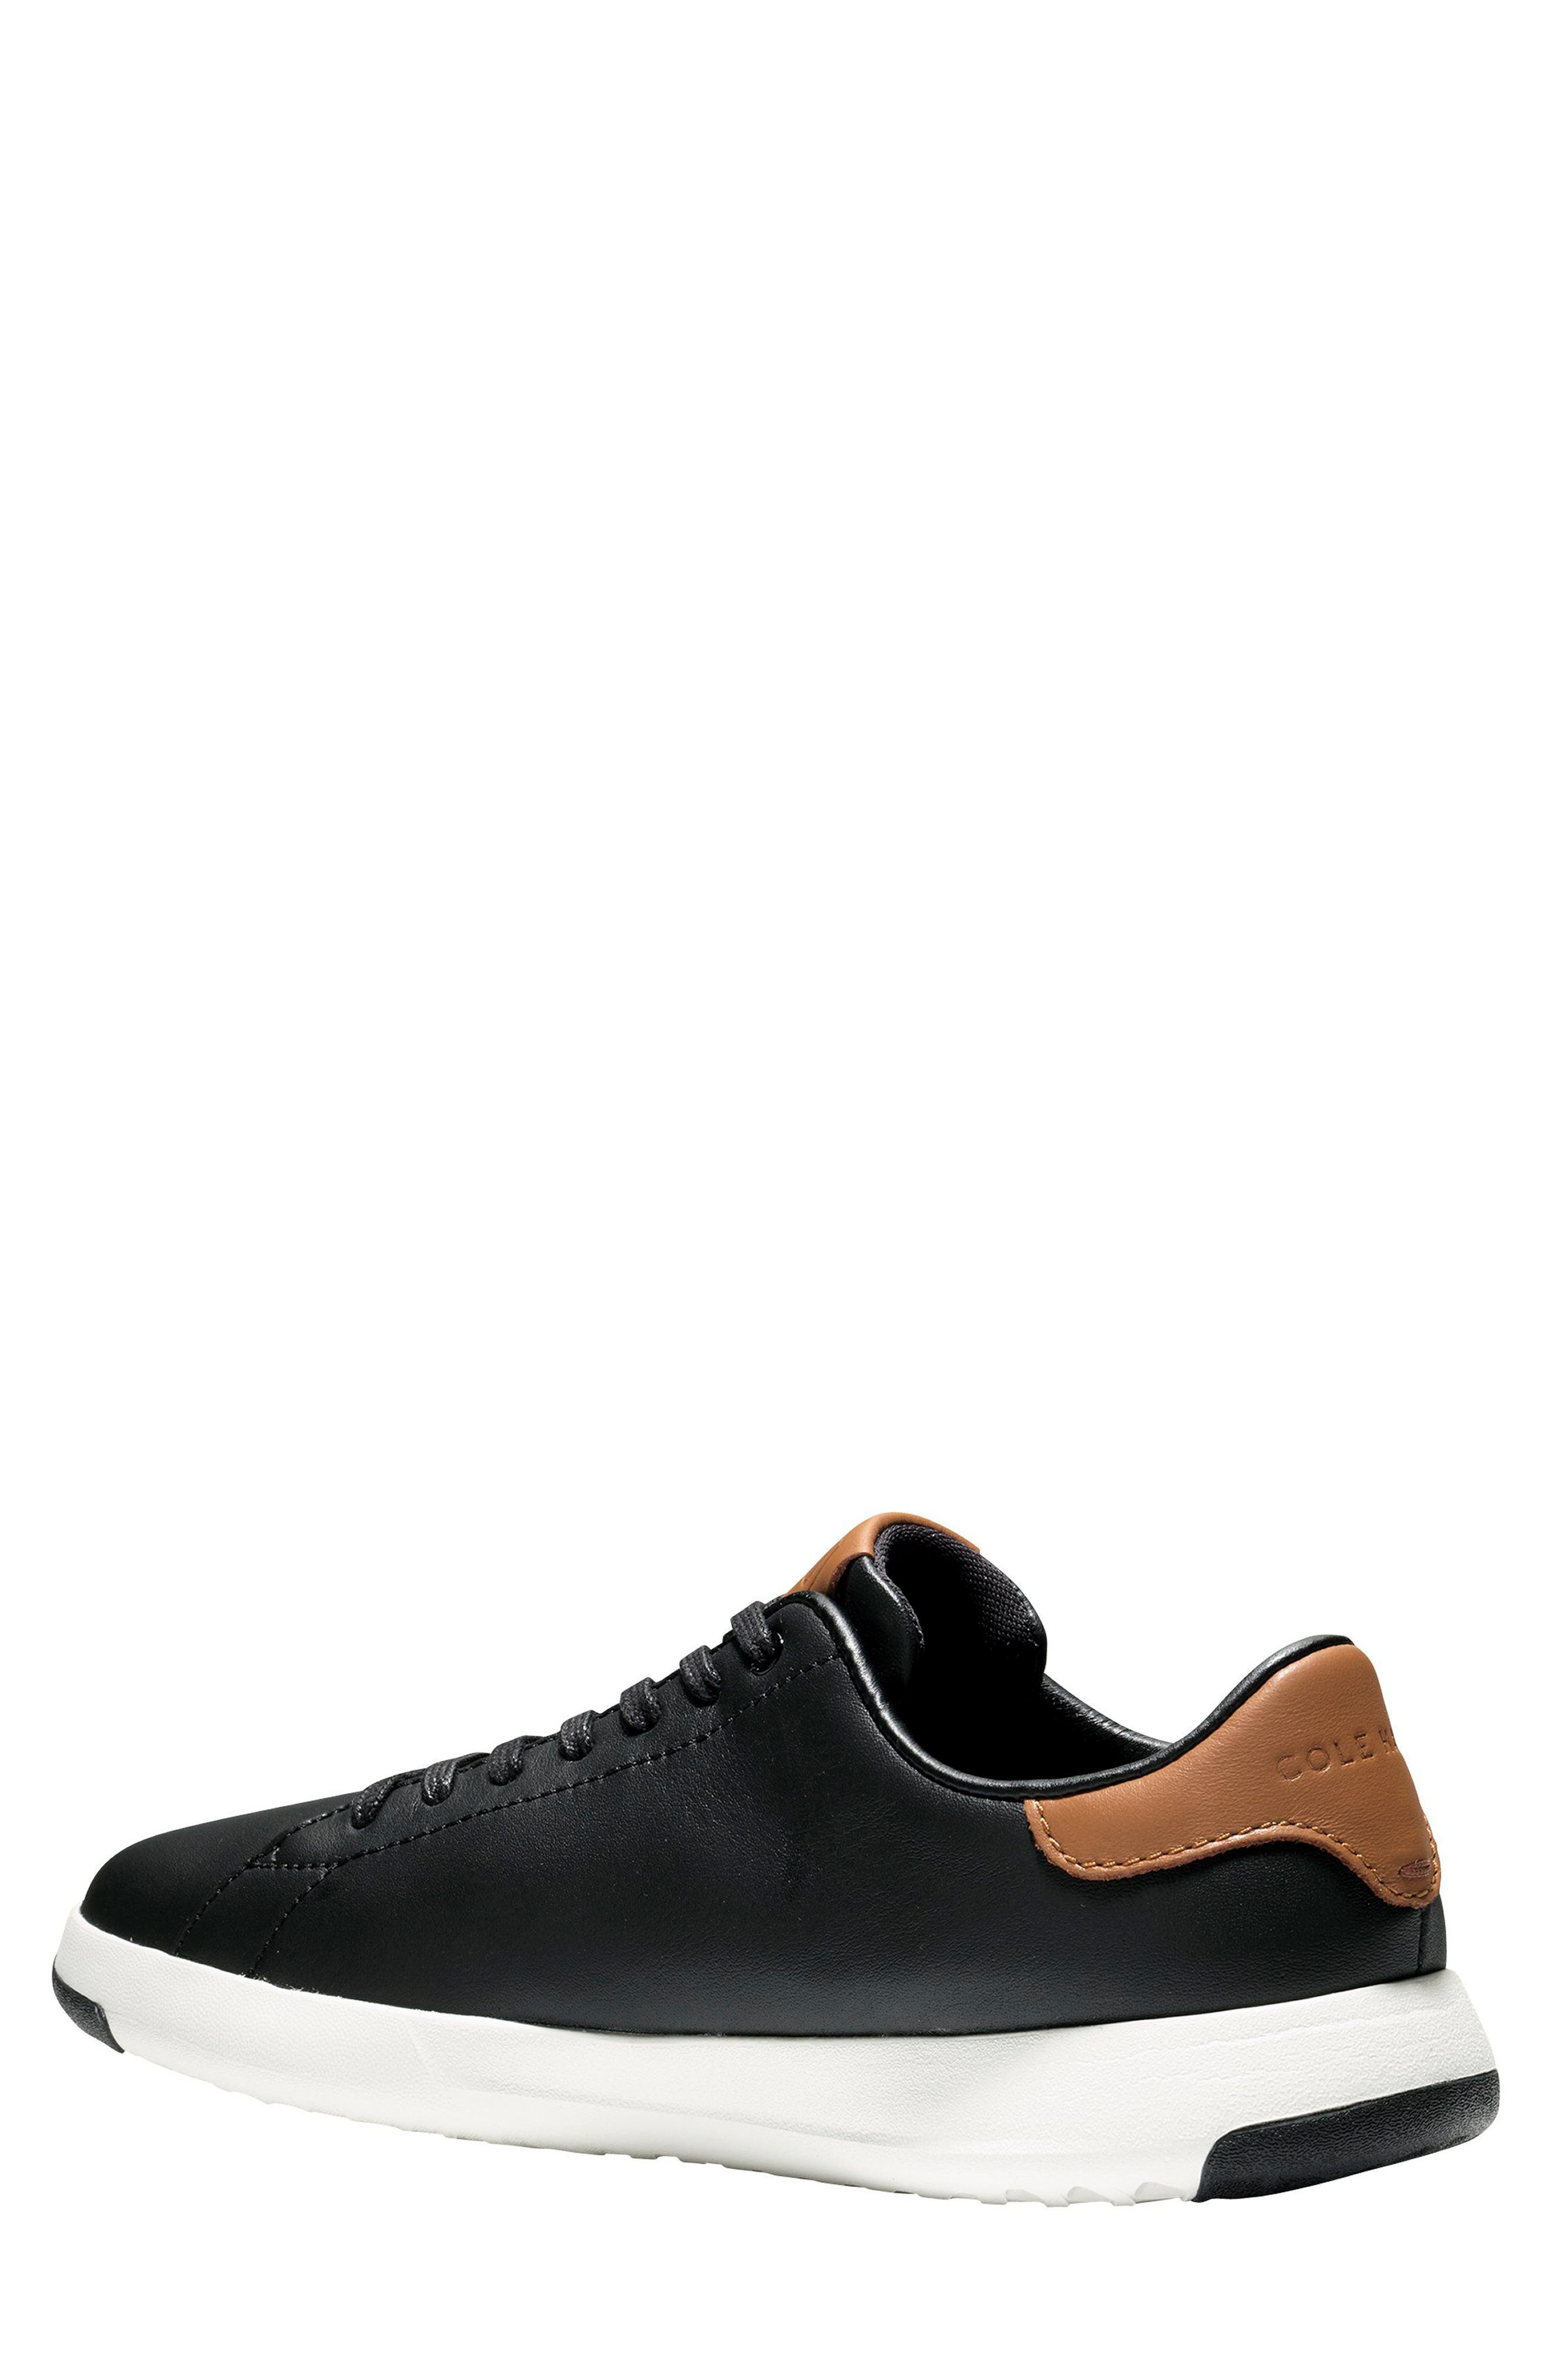 COLE HAAN, GrandPro Tennis Sneaker, Alternate thumbnail 2, color, BLACK/ BRITISH TAN